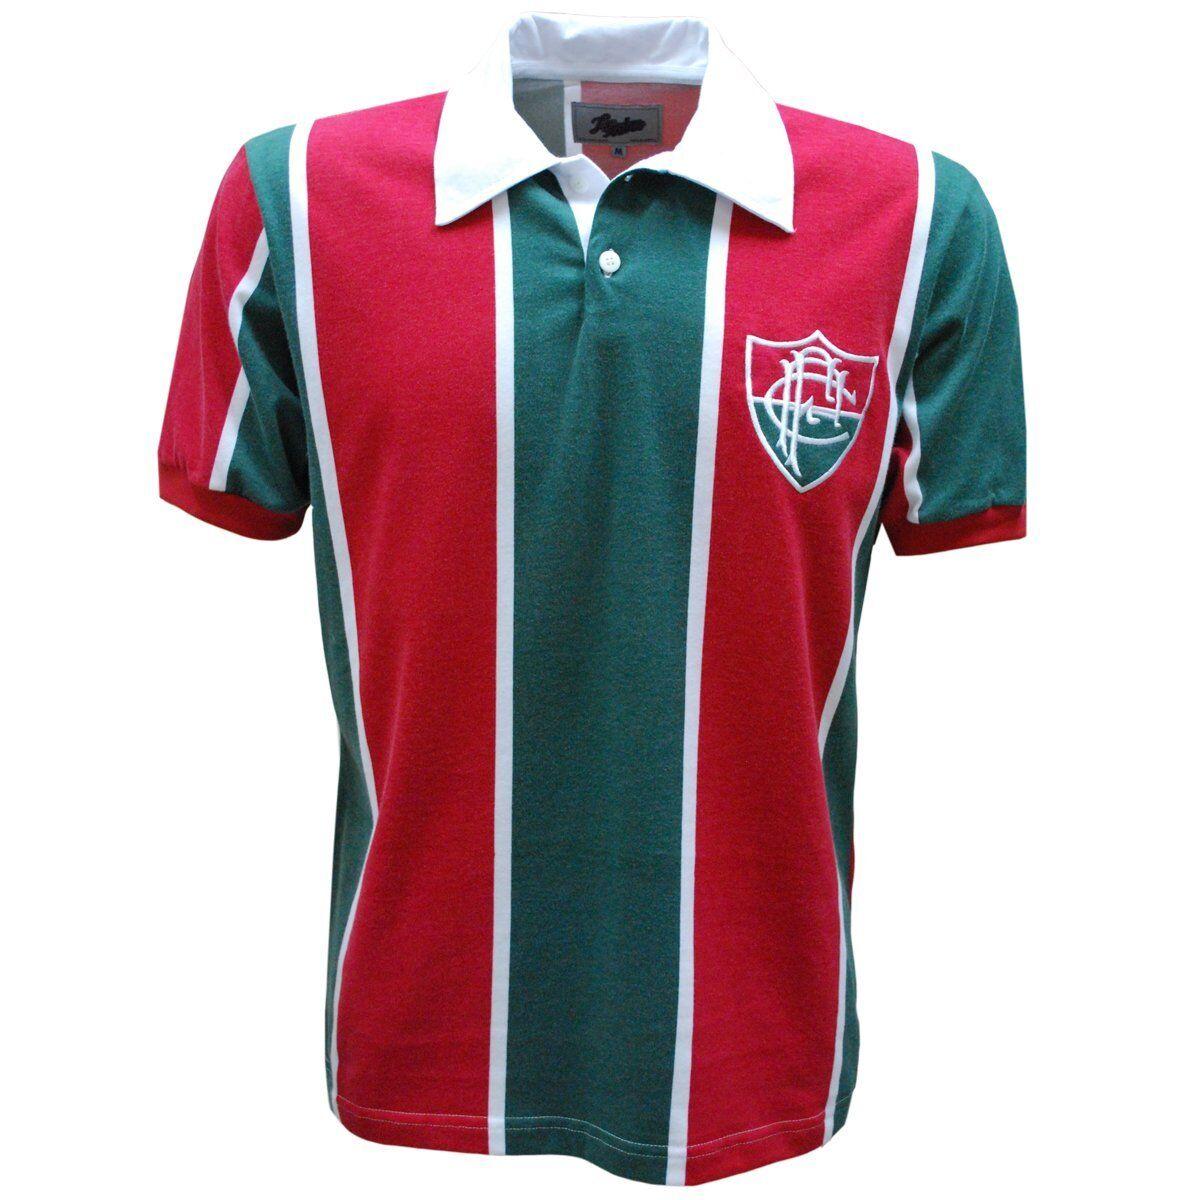 Fluminense 1913 Retro League Shirt Vintage Soccer Football Jersey